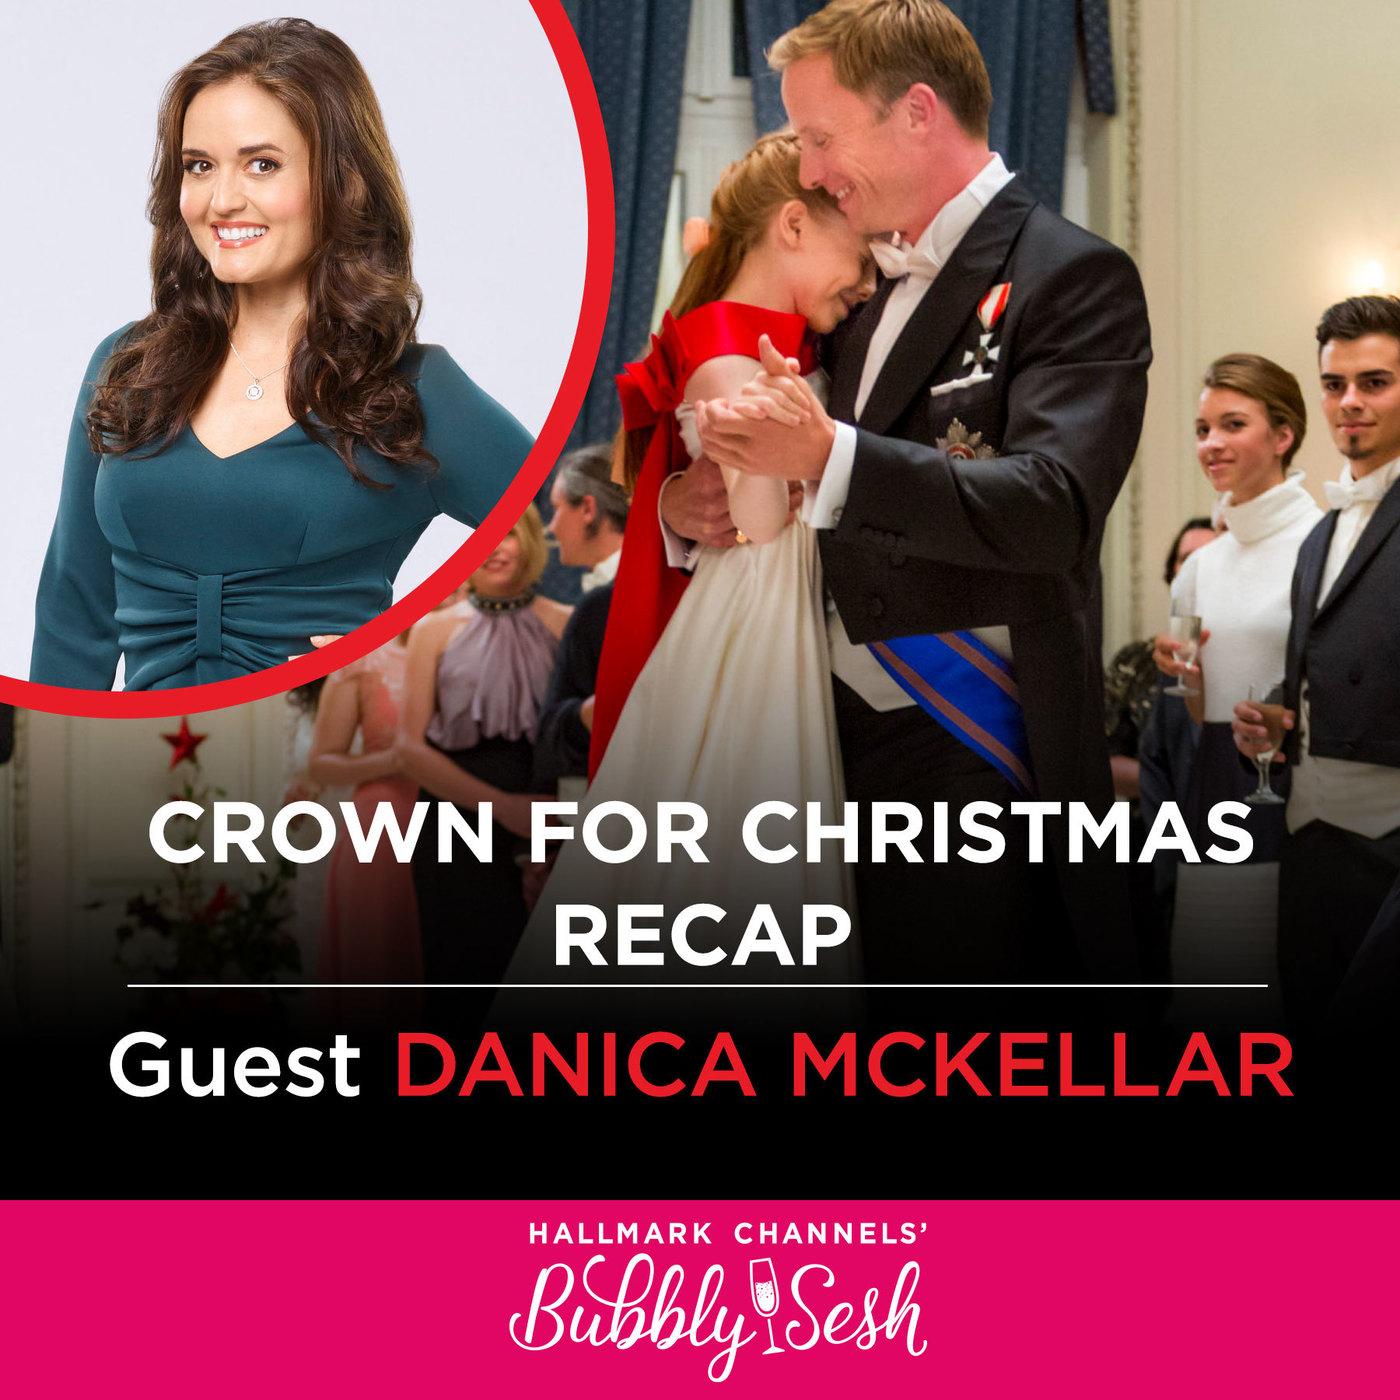 Crown for Christmas Recap with Guest Danica McKellar